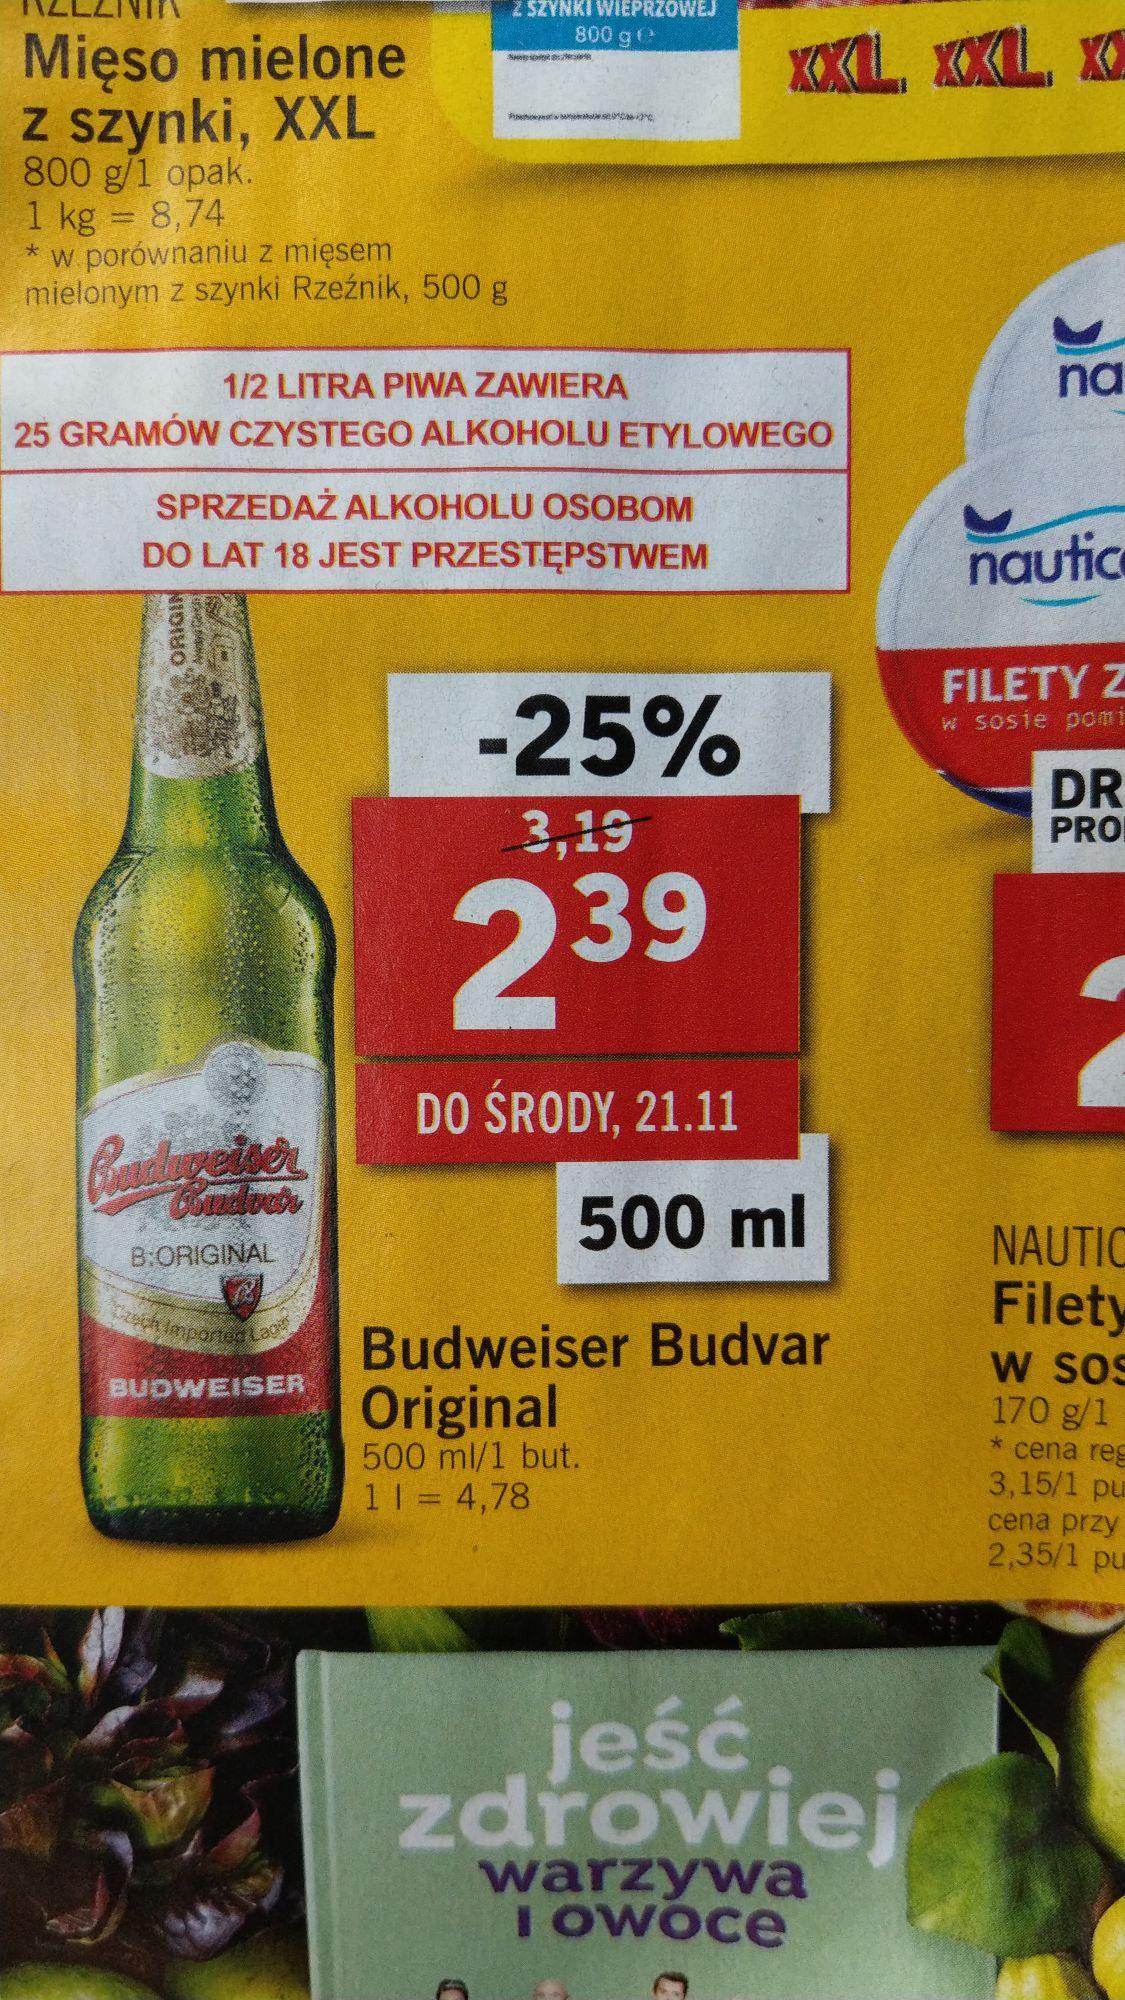 Piwo Budweiser 500ml lidl